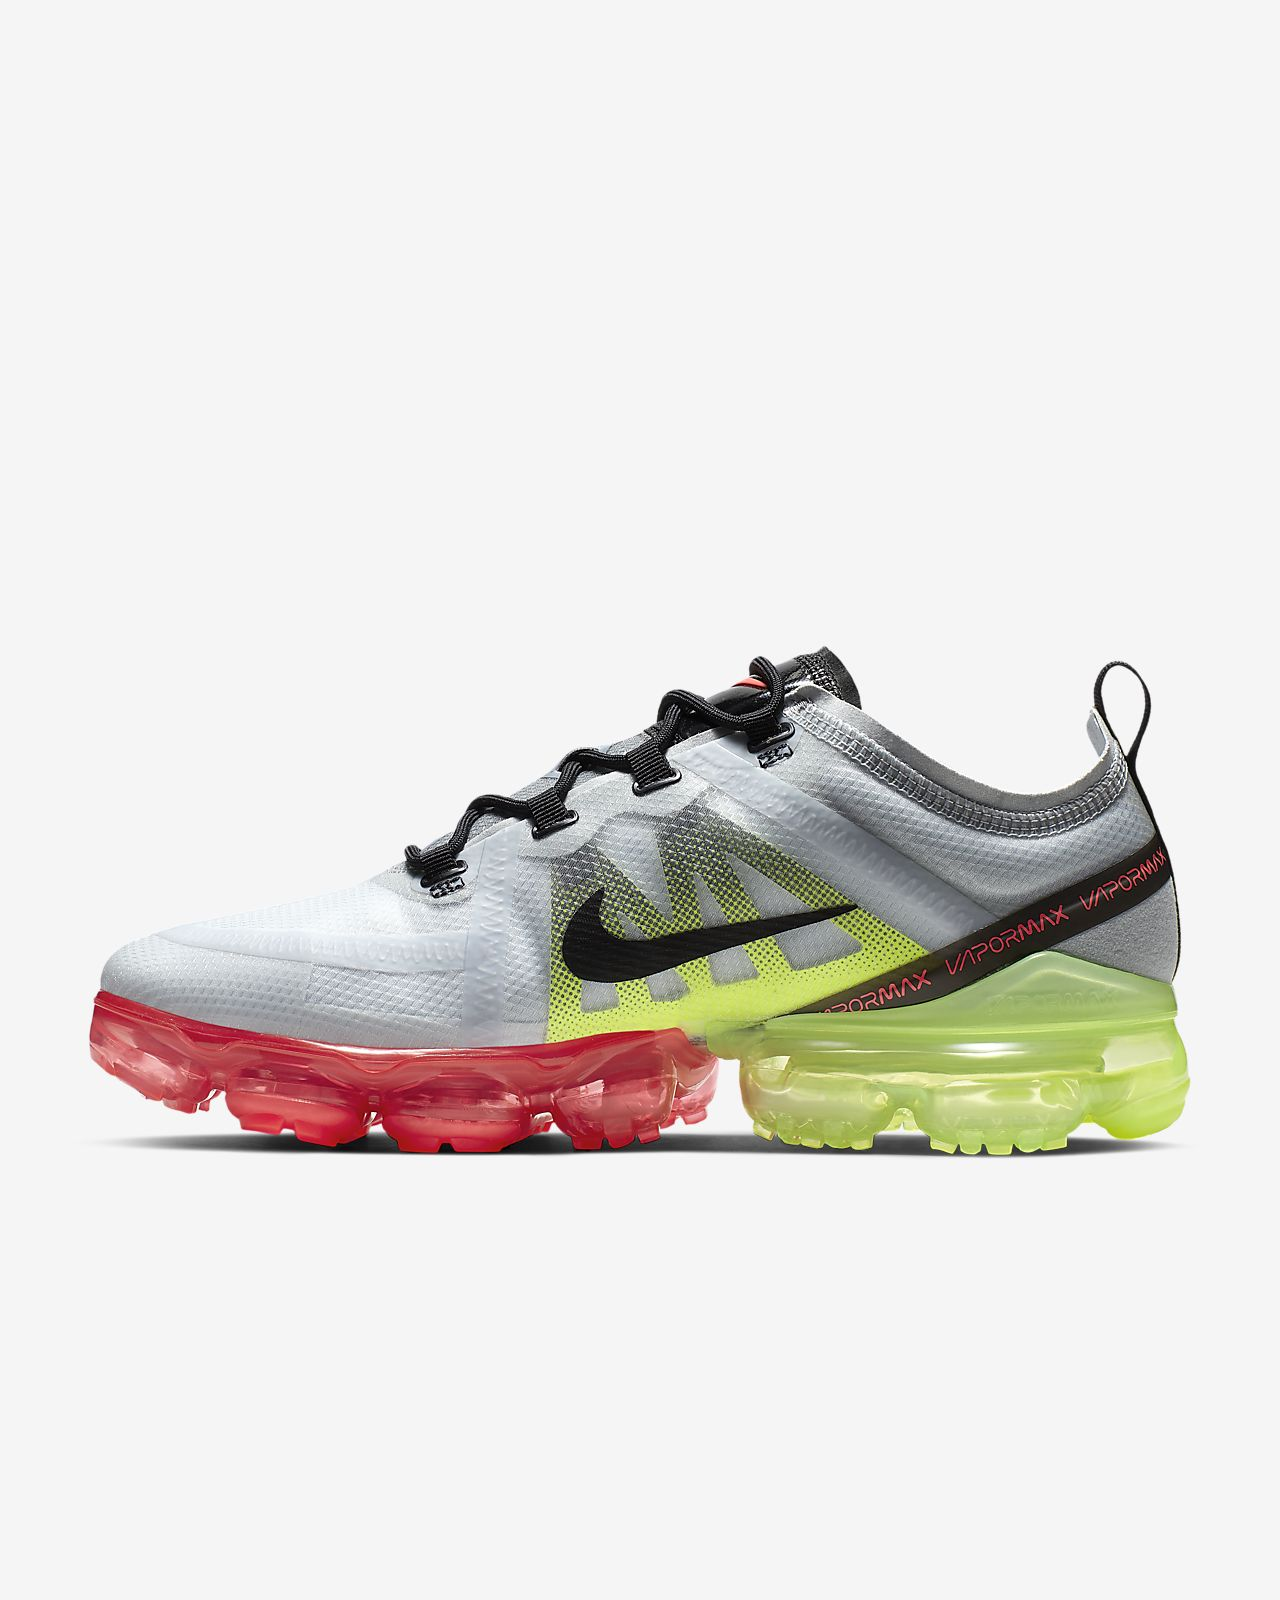 Nike Shoes on | Sneaks in 2019 | Cheap nike air max, Nike